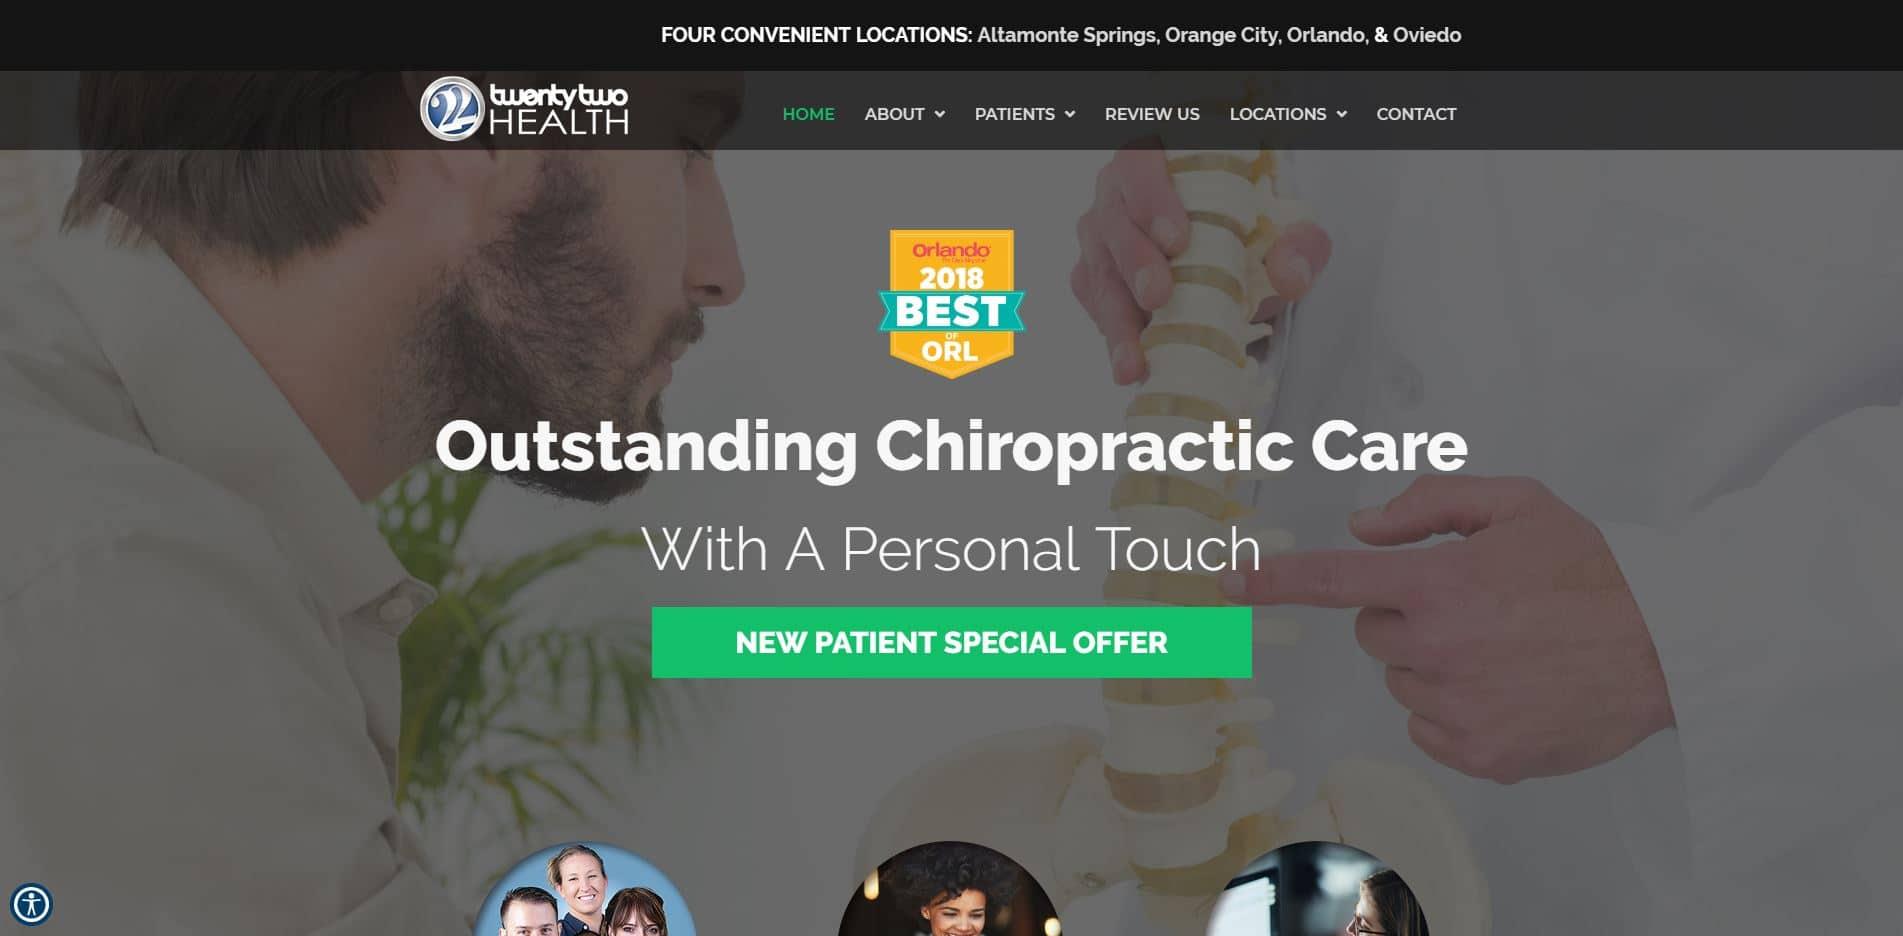 Chiropractor in Altamonte Springs